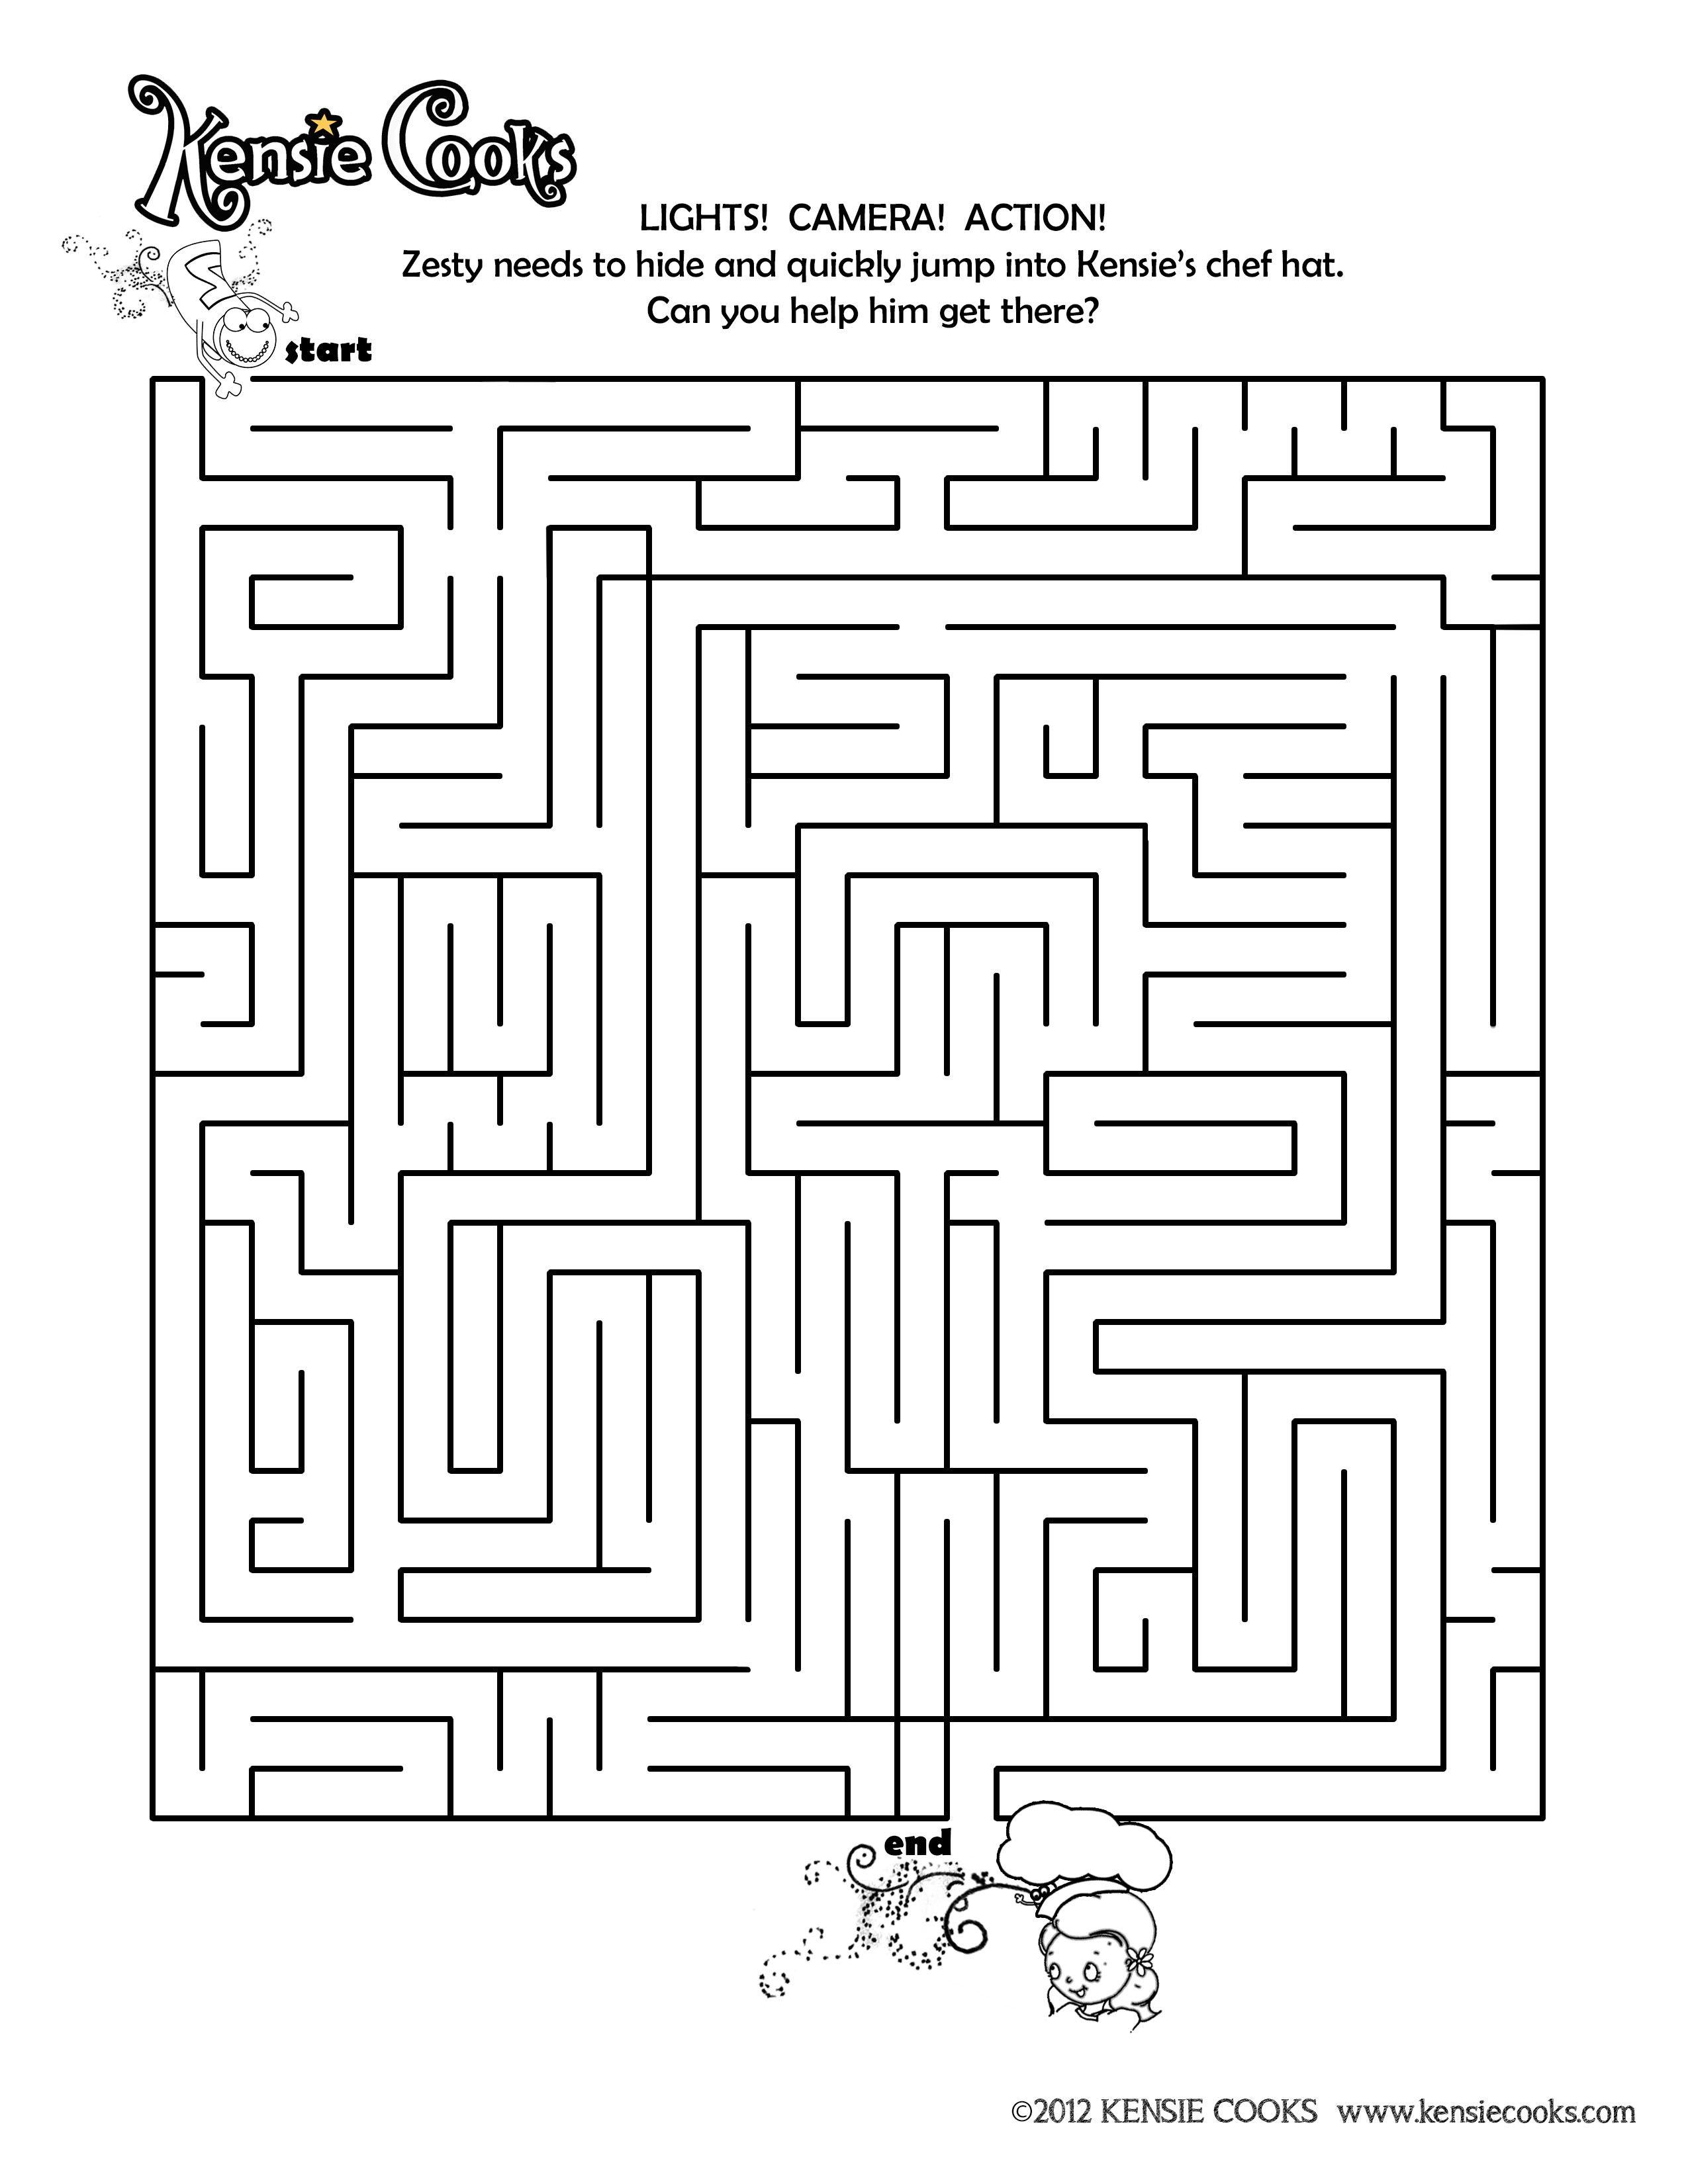 Kensie Cooks Maze Quick Kids Help Zesty Find His Way